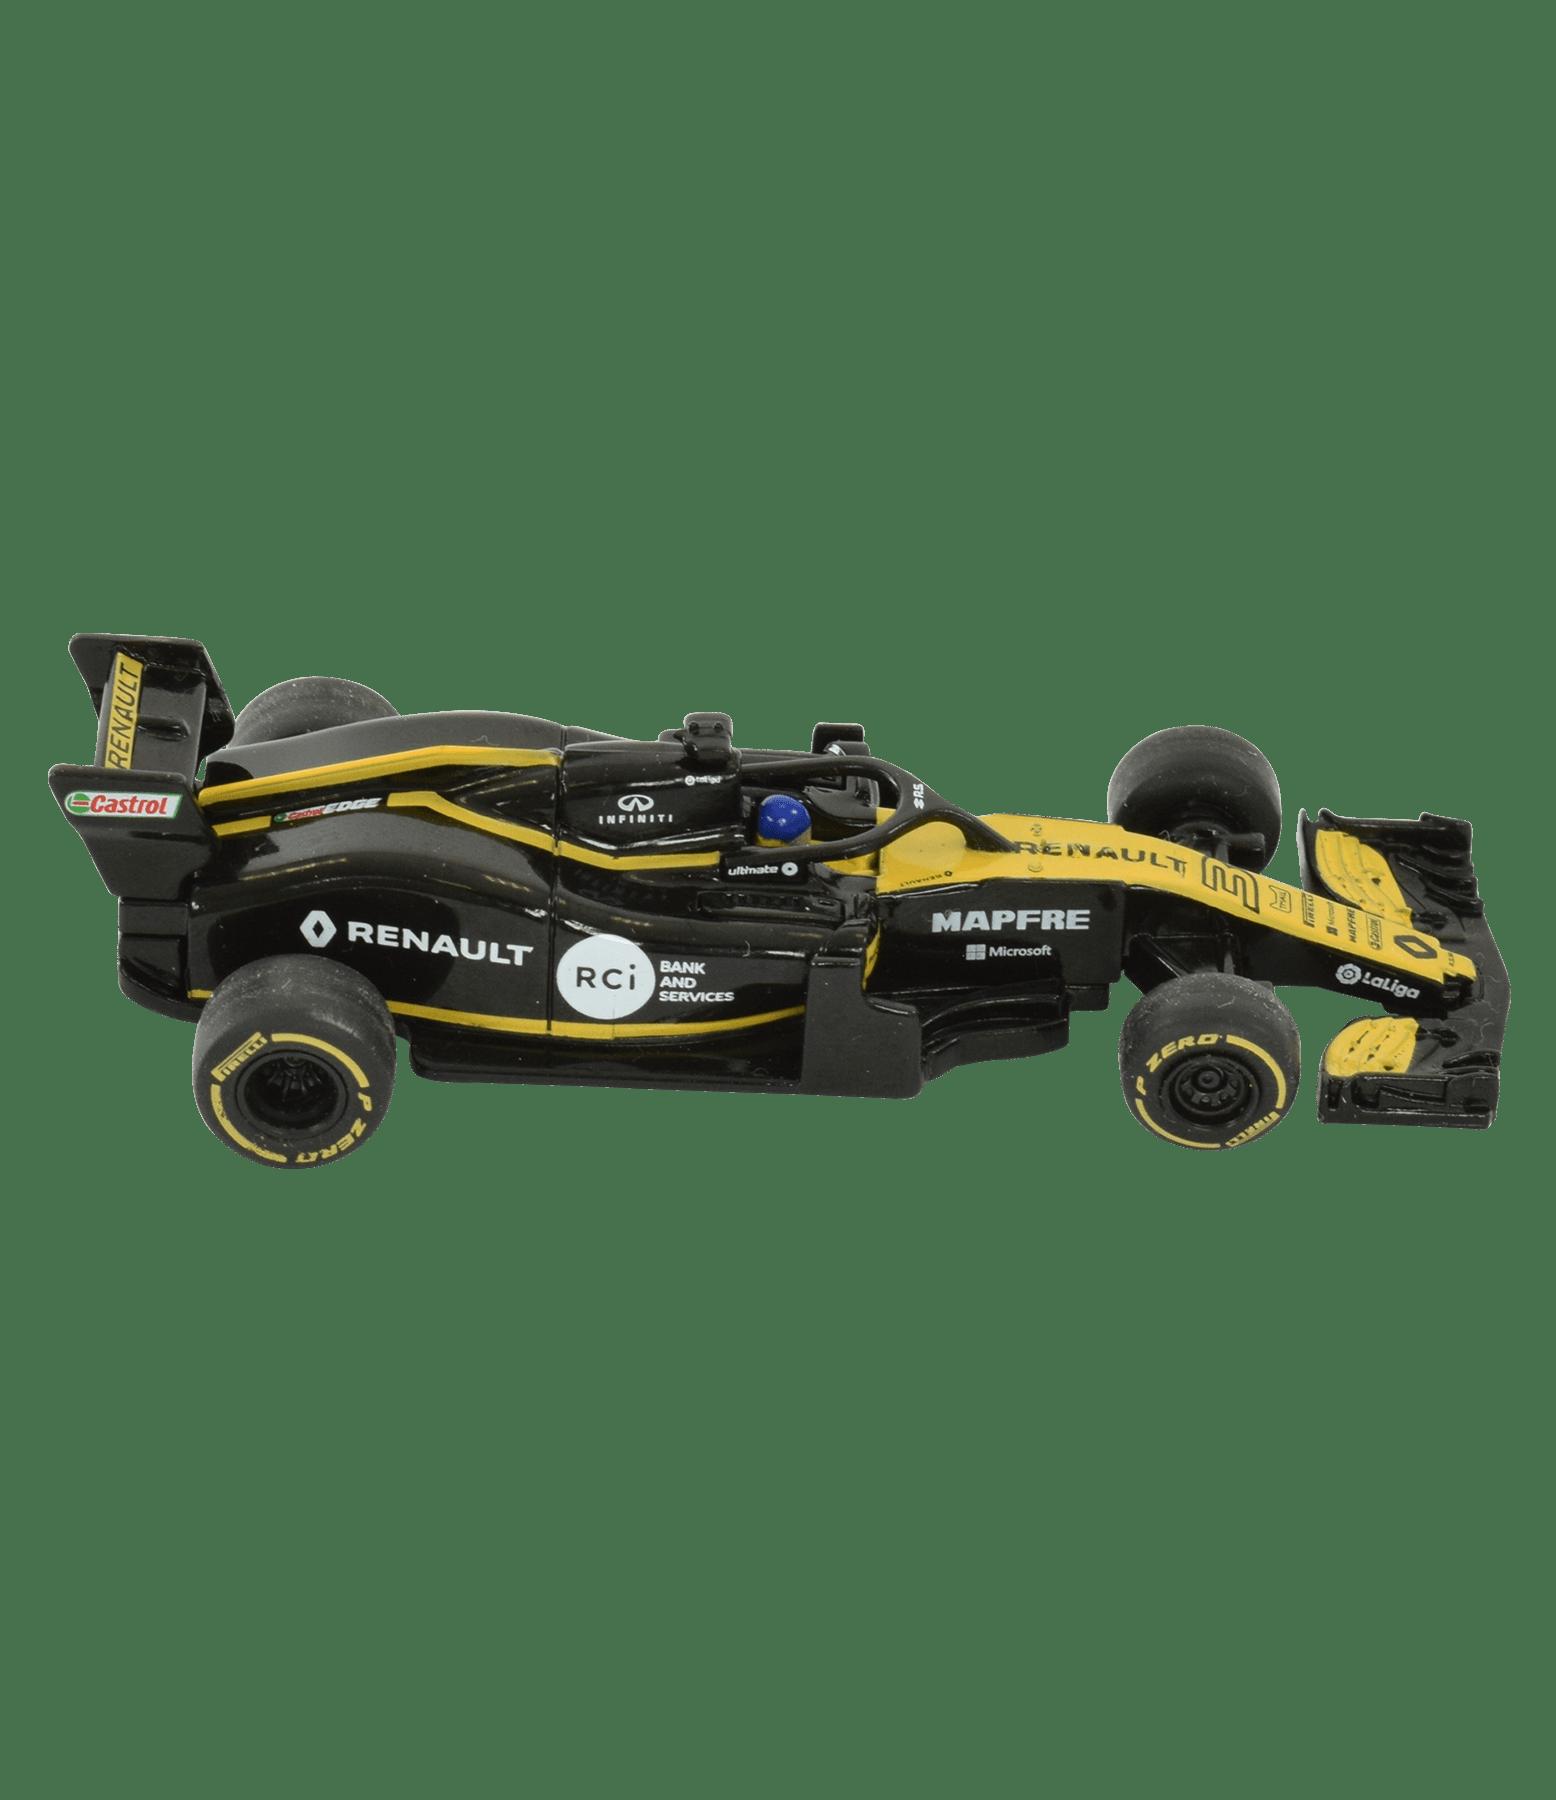 2019 F1 Renault R S 19: RENAULT F1® Team 2019 R.S.19 #3 Daniel Ricciardo Model Car